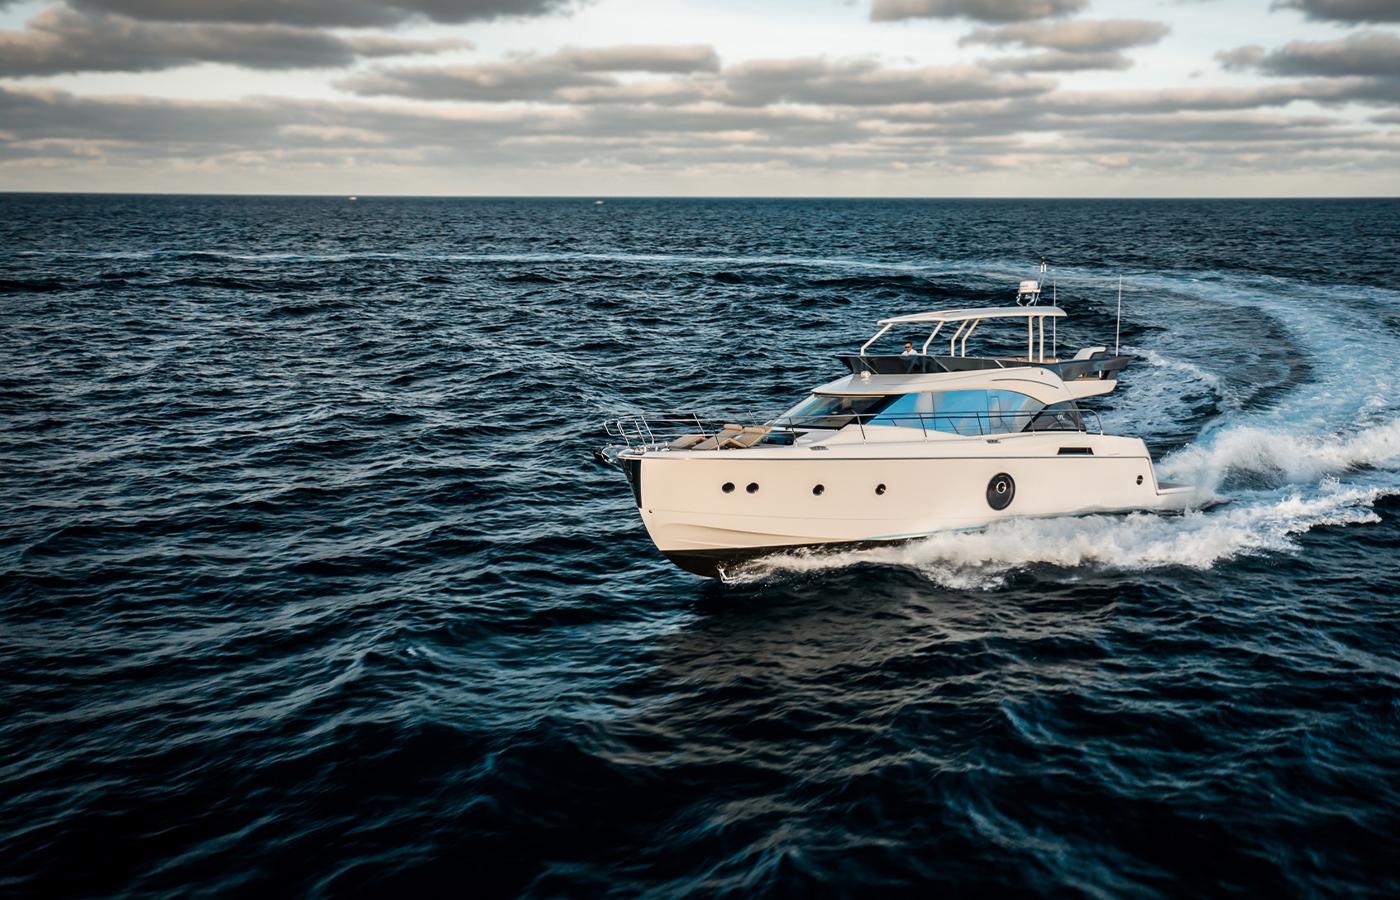 Top 5 Motor Yachts Under 100 Feet [New + Brokerage]